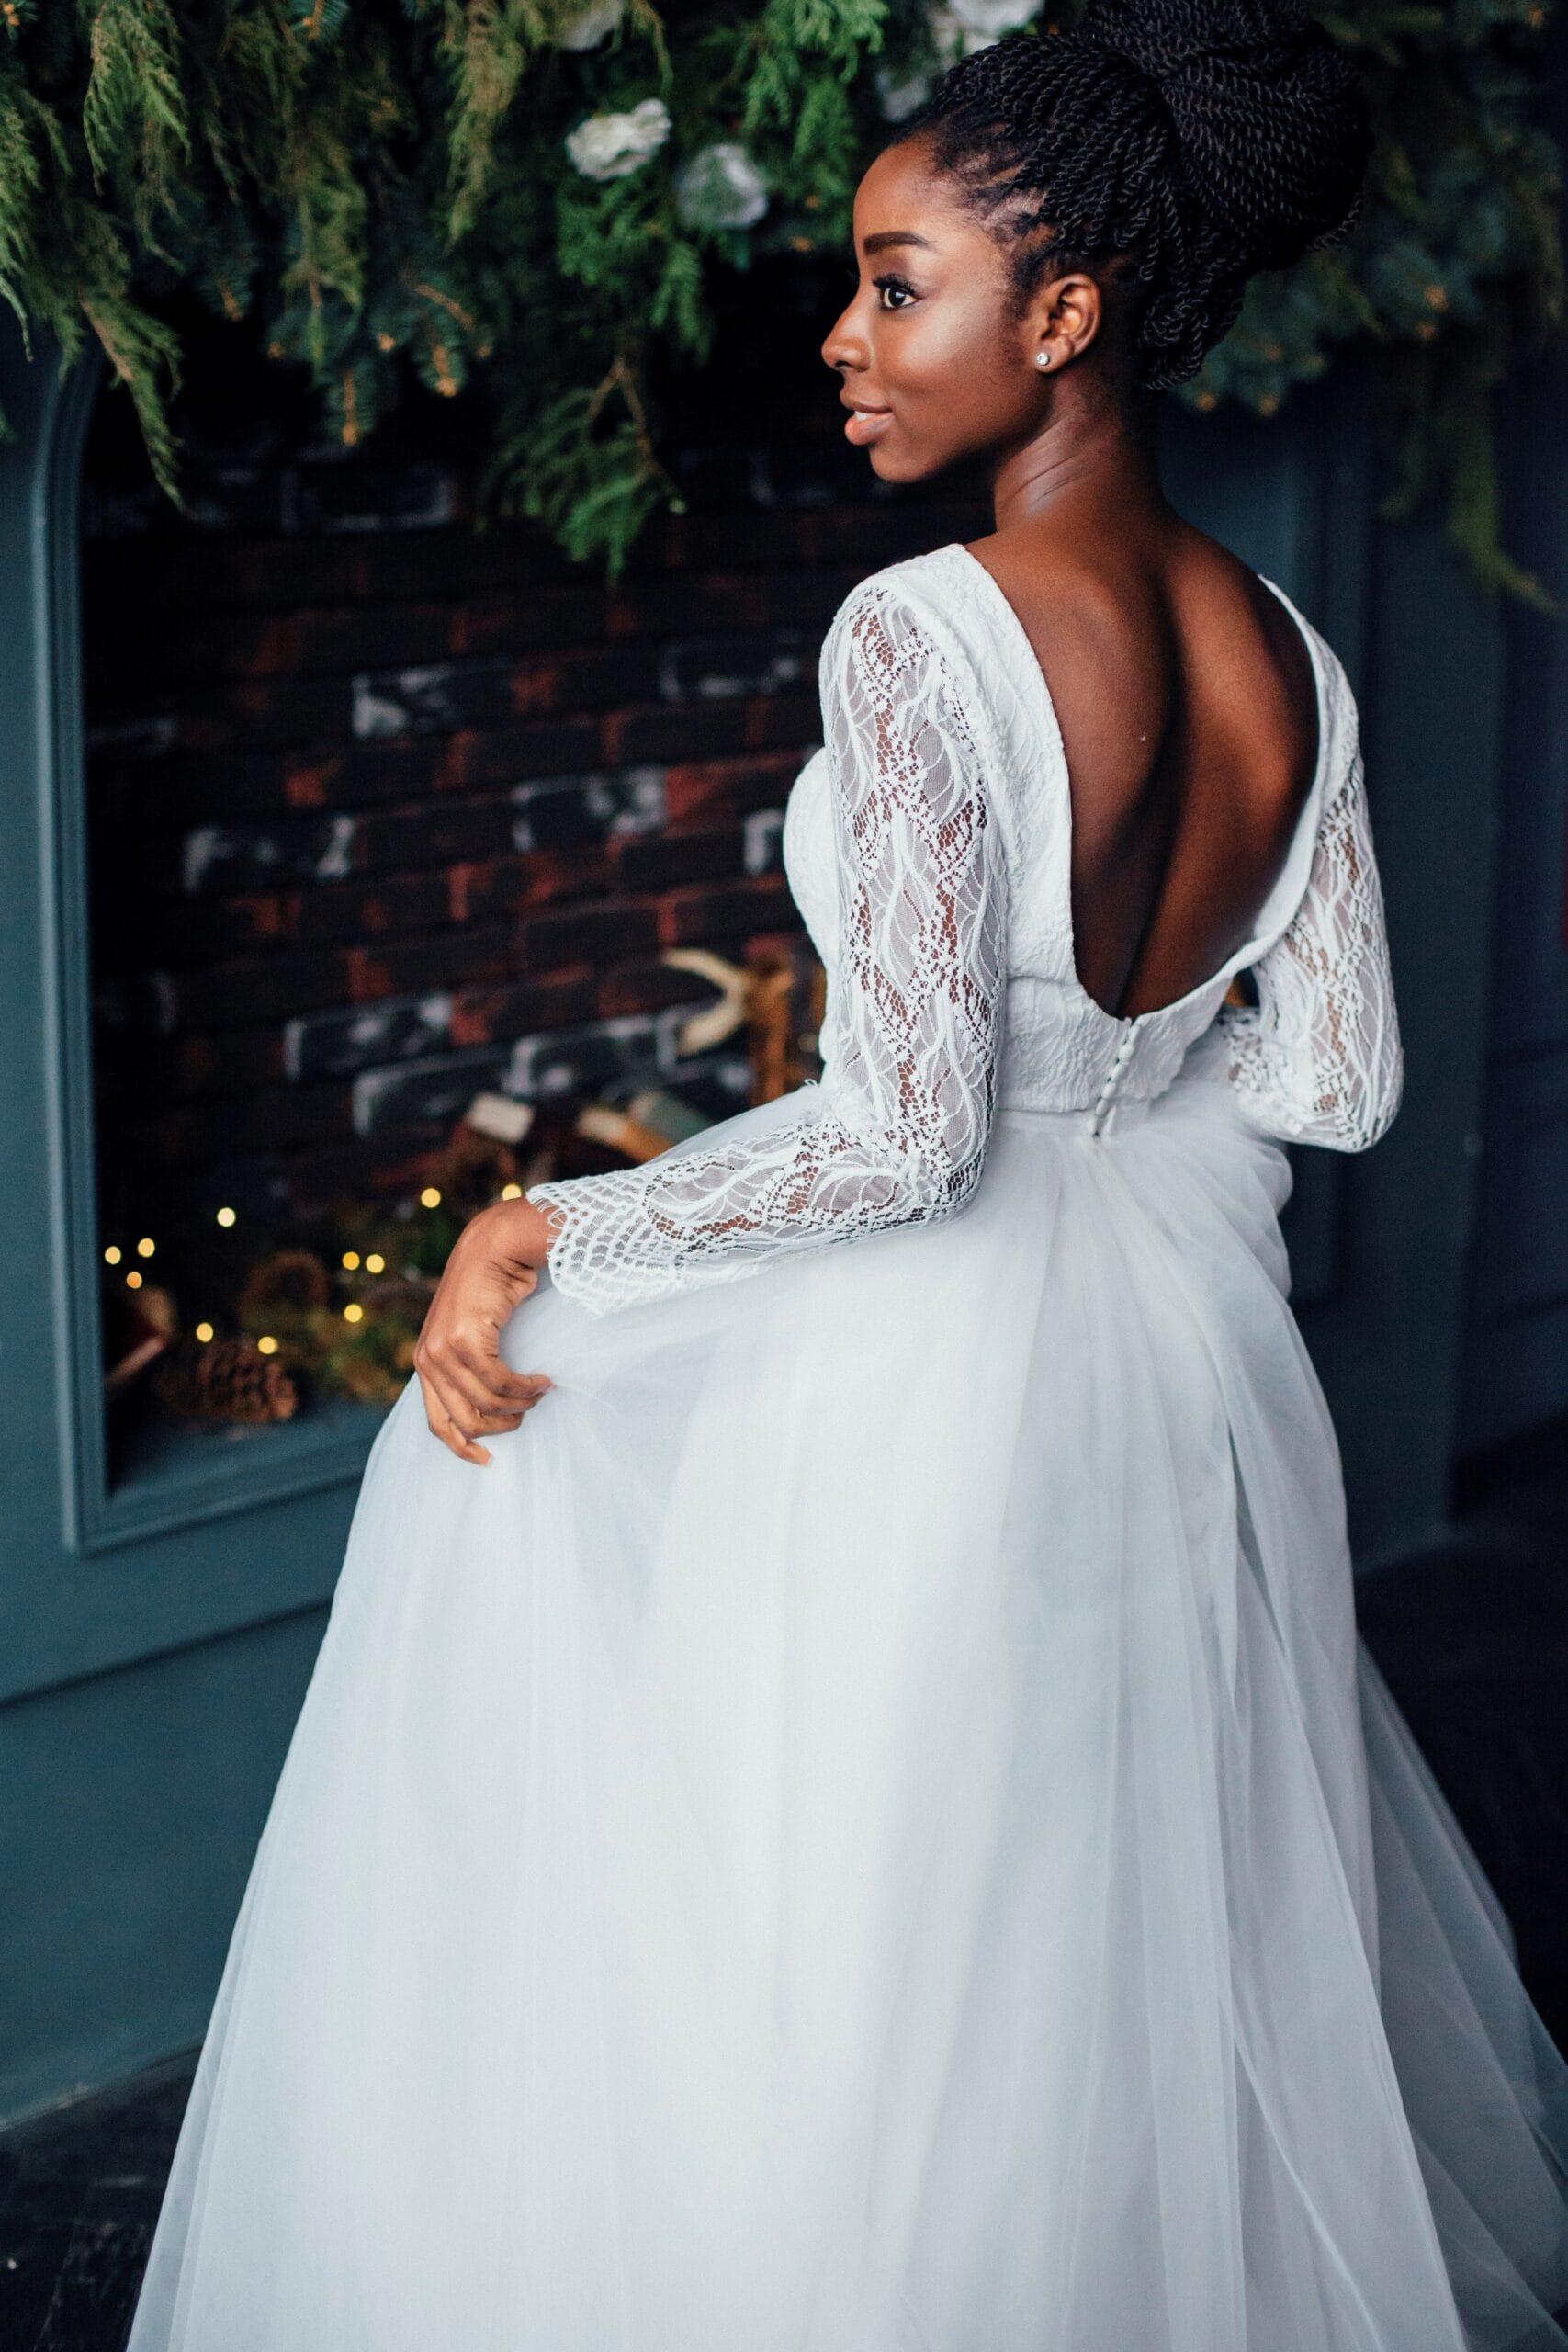 Свадебное платье JESSICA, коллекция THE ABSOLUTE LOVE, бренд RARE BRIDAL, фото 4